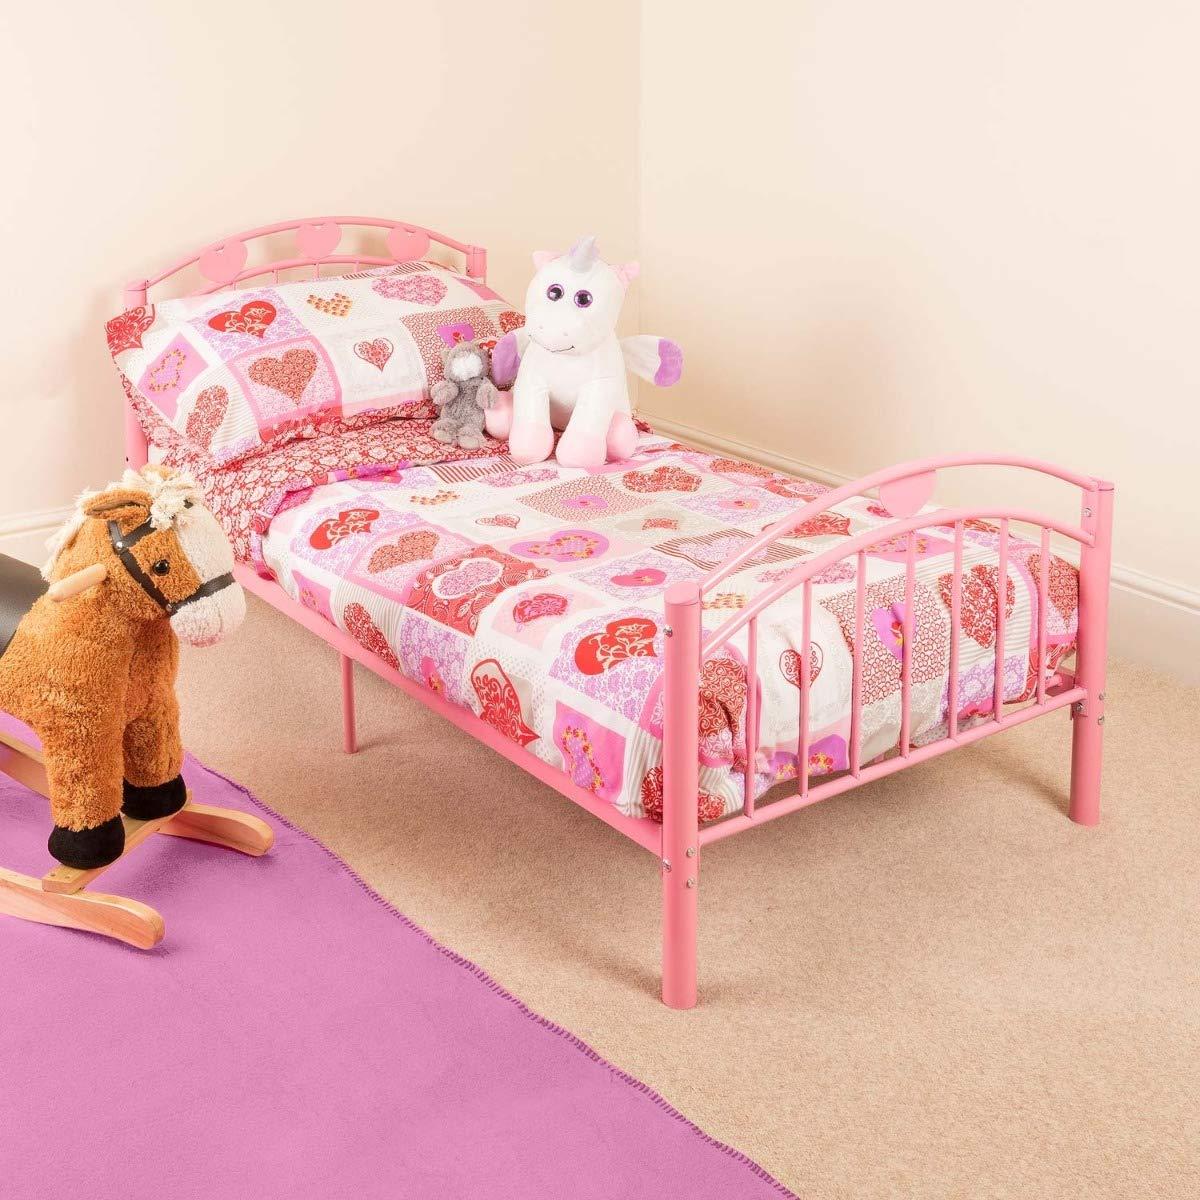 Miraculous Pink Toddler Metal Bed Frame Kids Bedroom Furniture Childrens Bedframe Hearts Home Interior And Landscaping Ymoonbapapsignezvosmurscom